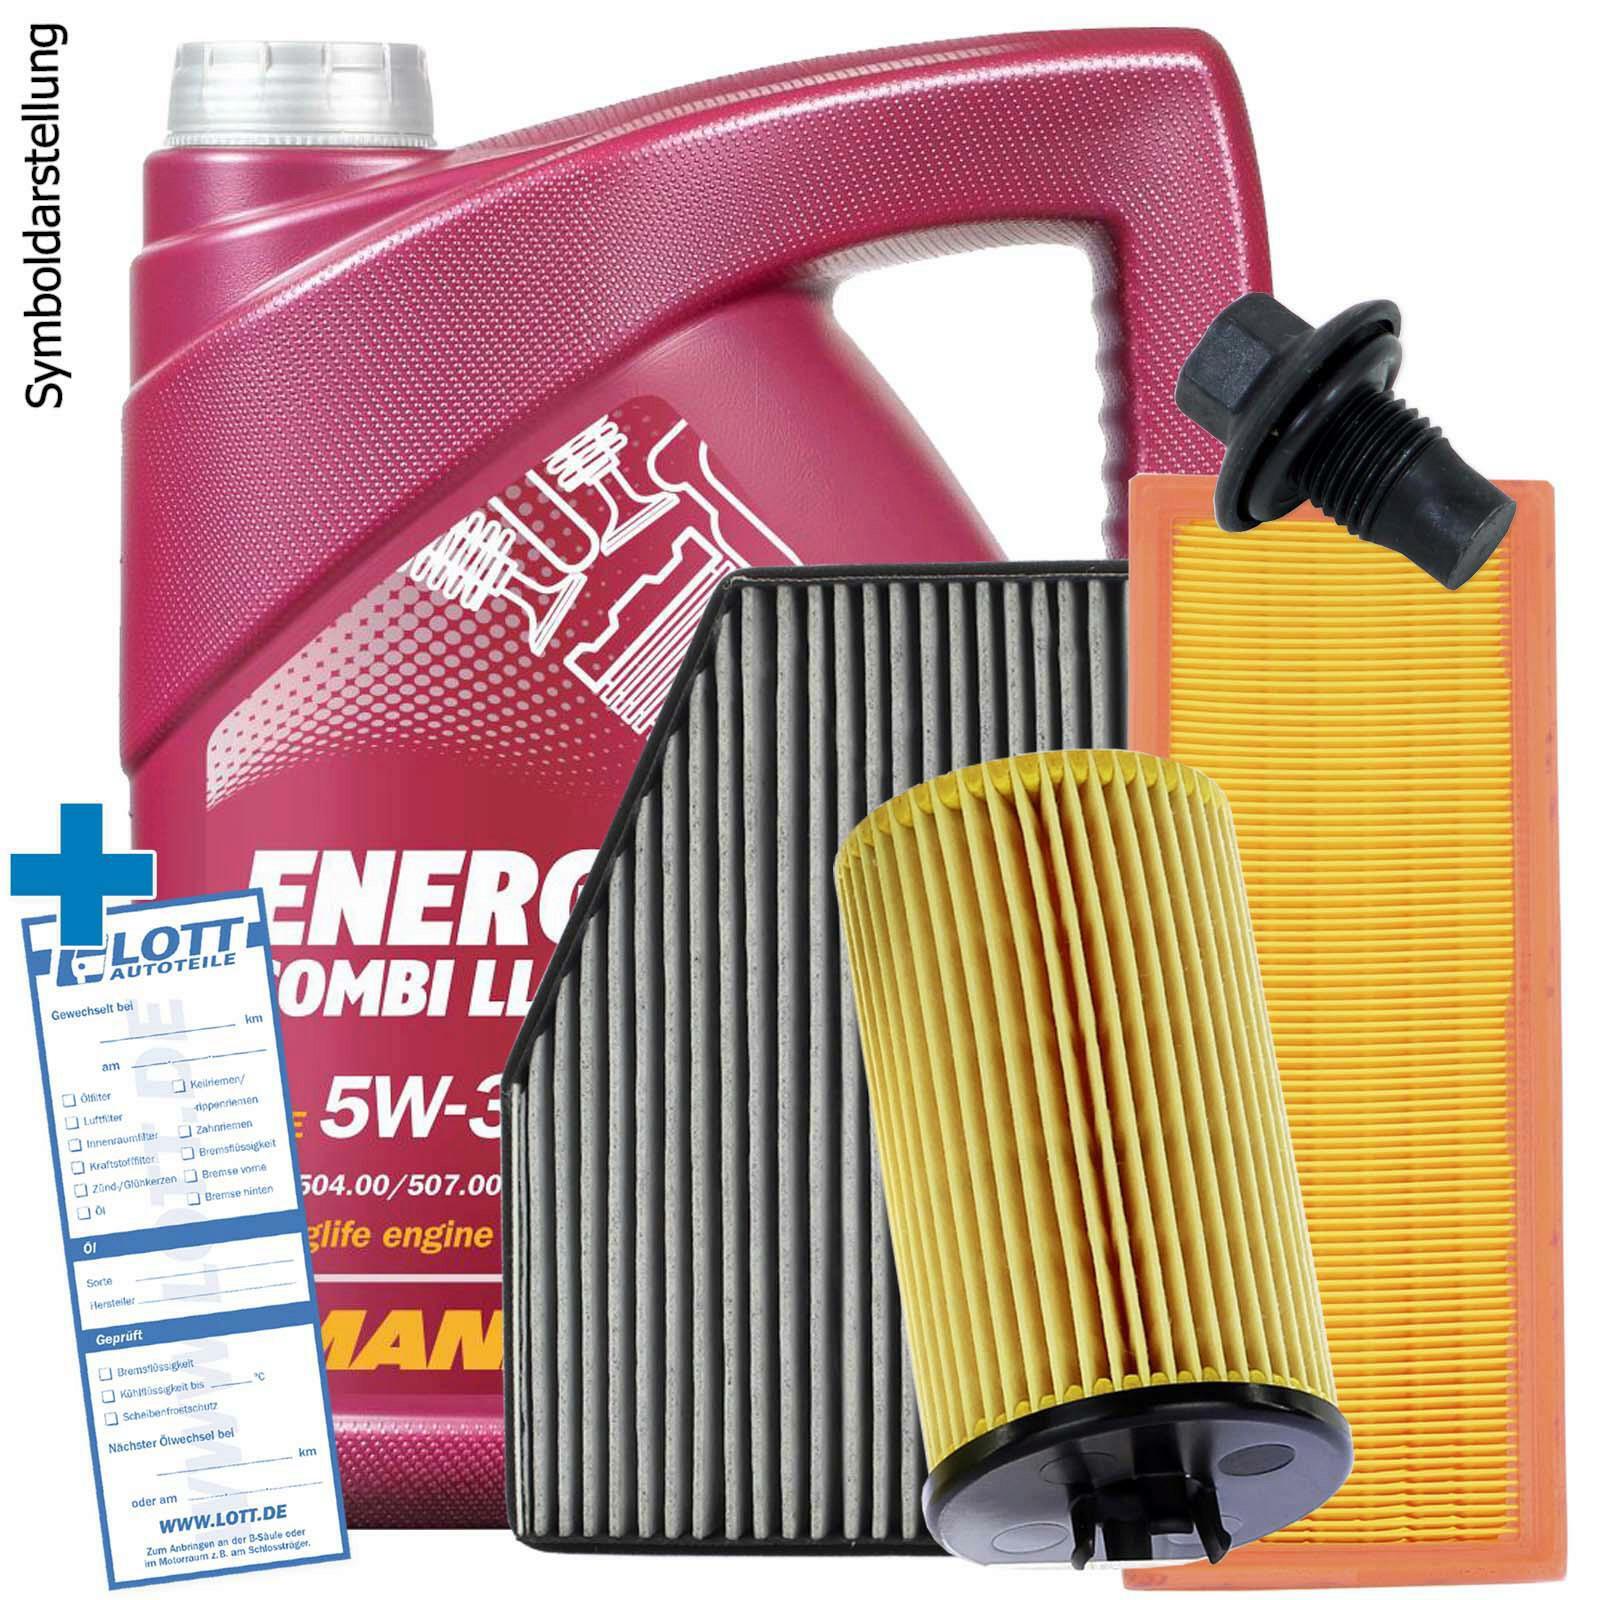 Mannol Motoröl + Ölfilter + Luftfilter + Innenraumfilter + Ablassschraube